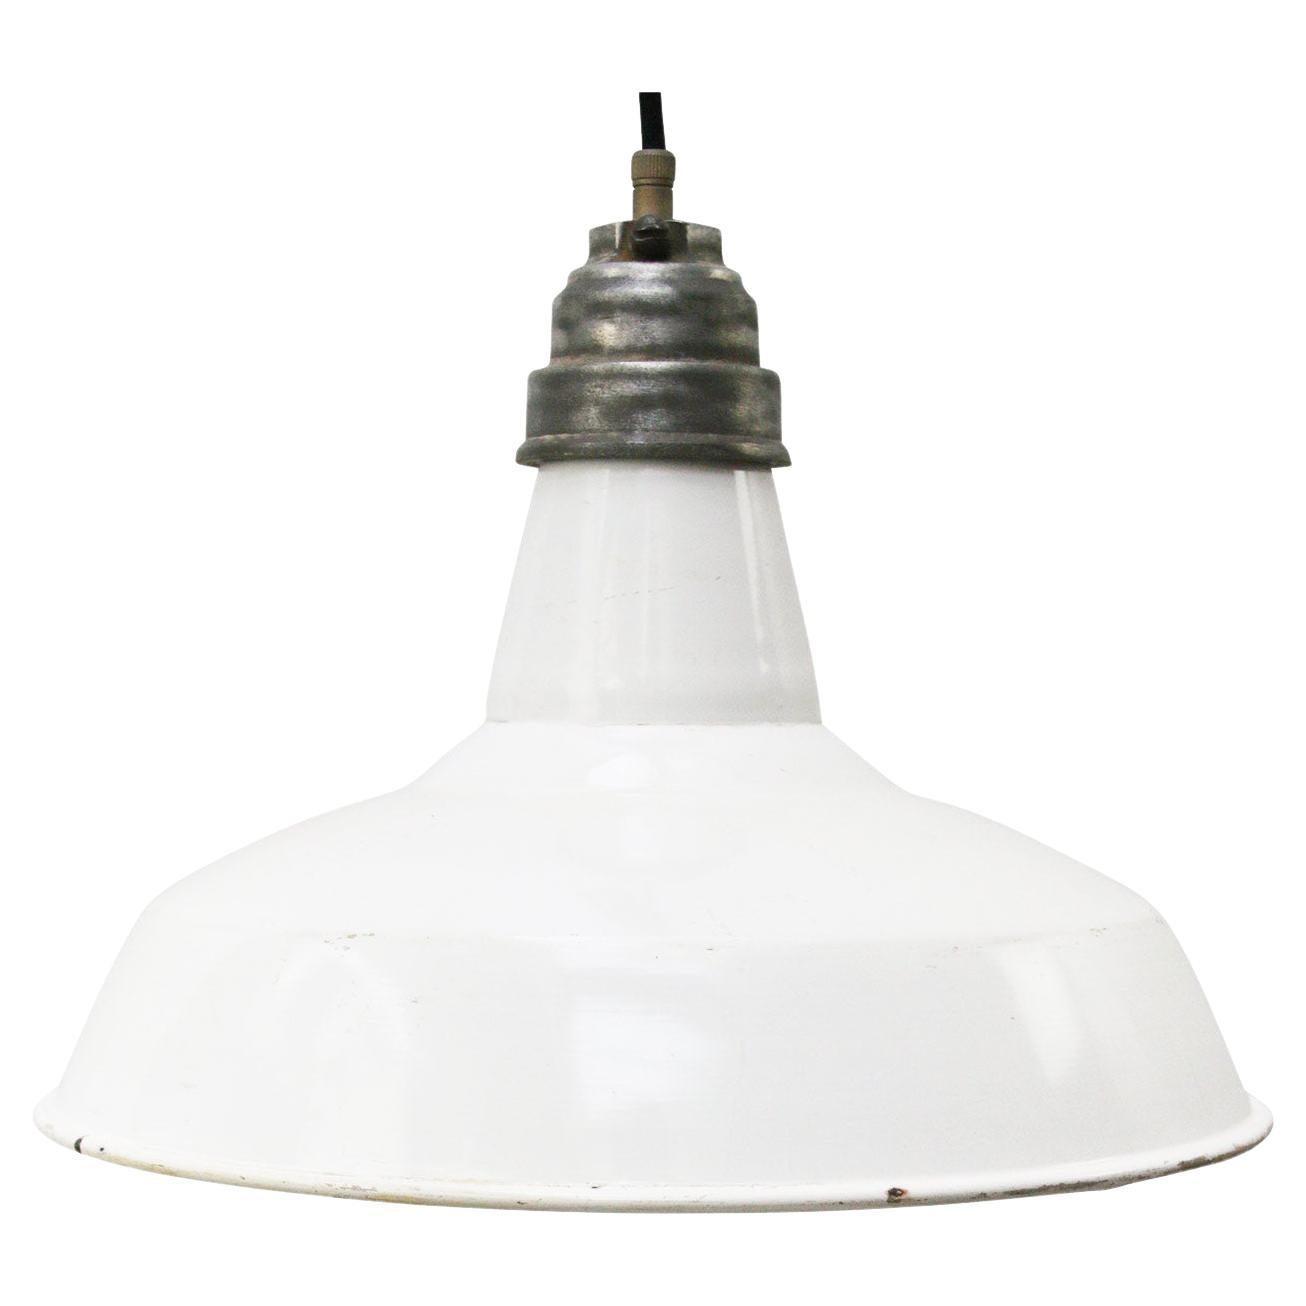 White Enamel Vintage Industrial Factory Pendant Lights by Benjamin USA